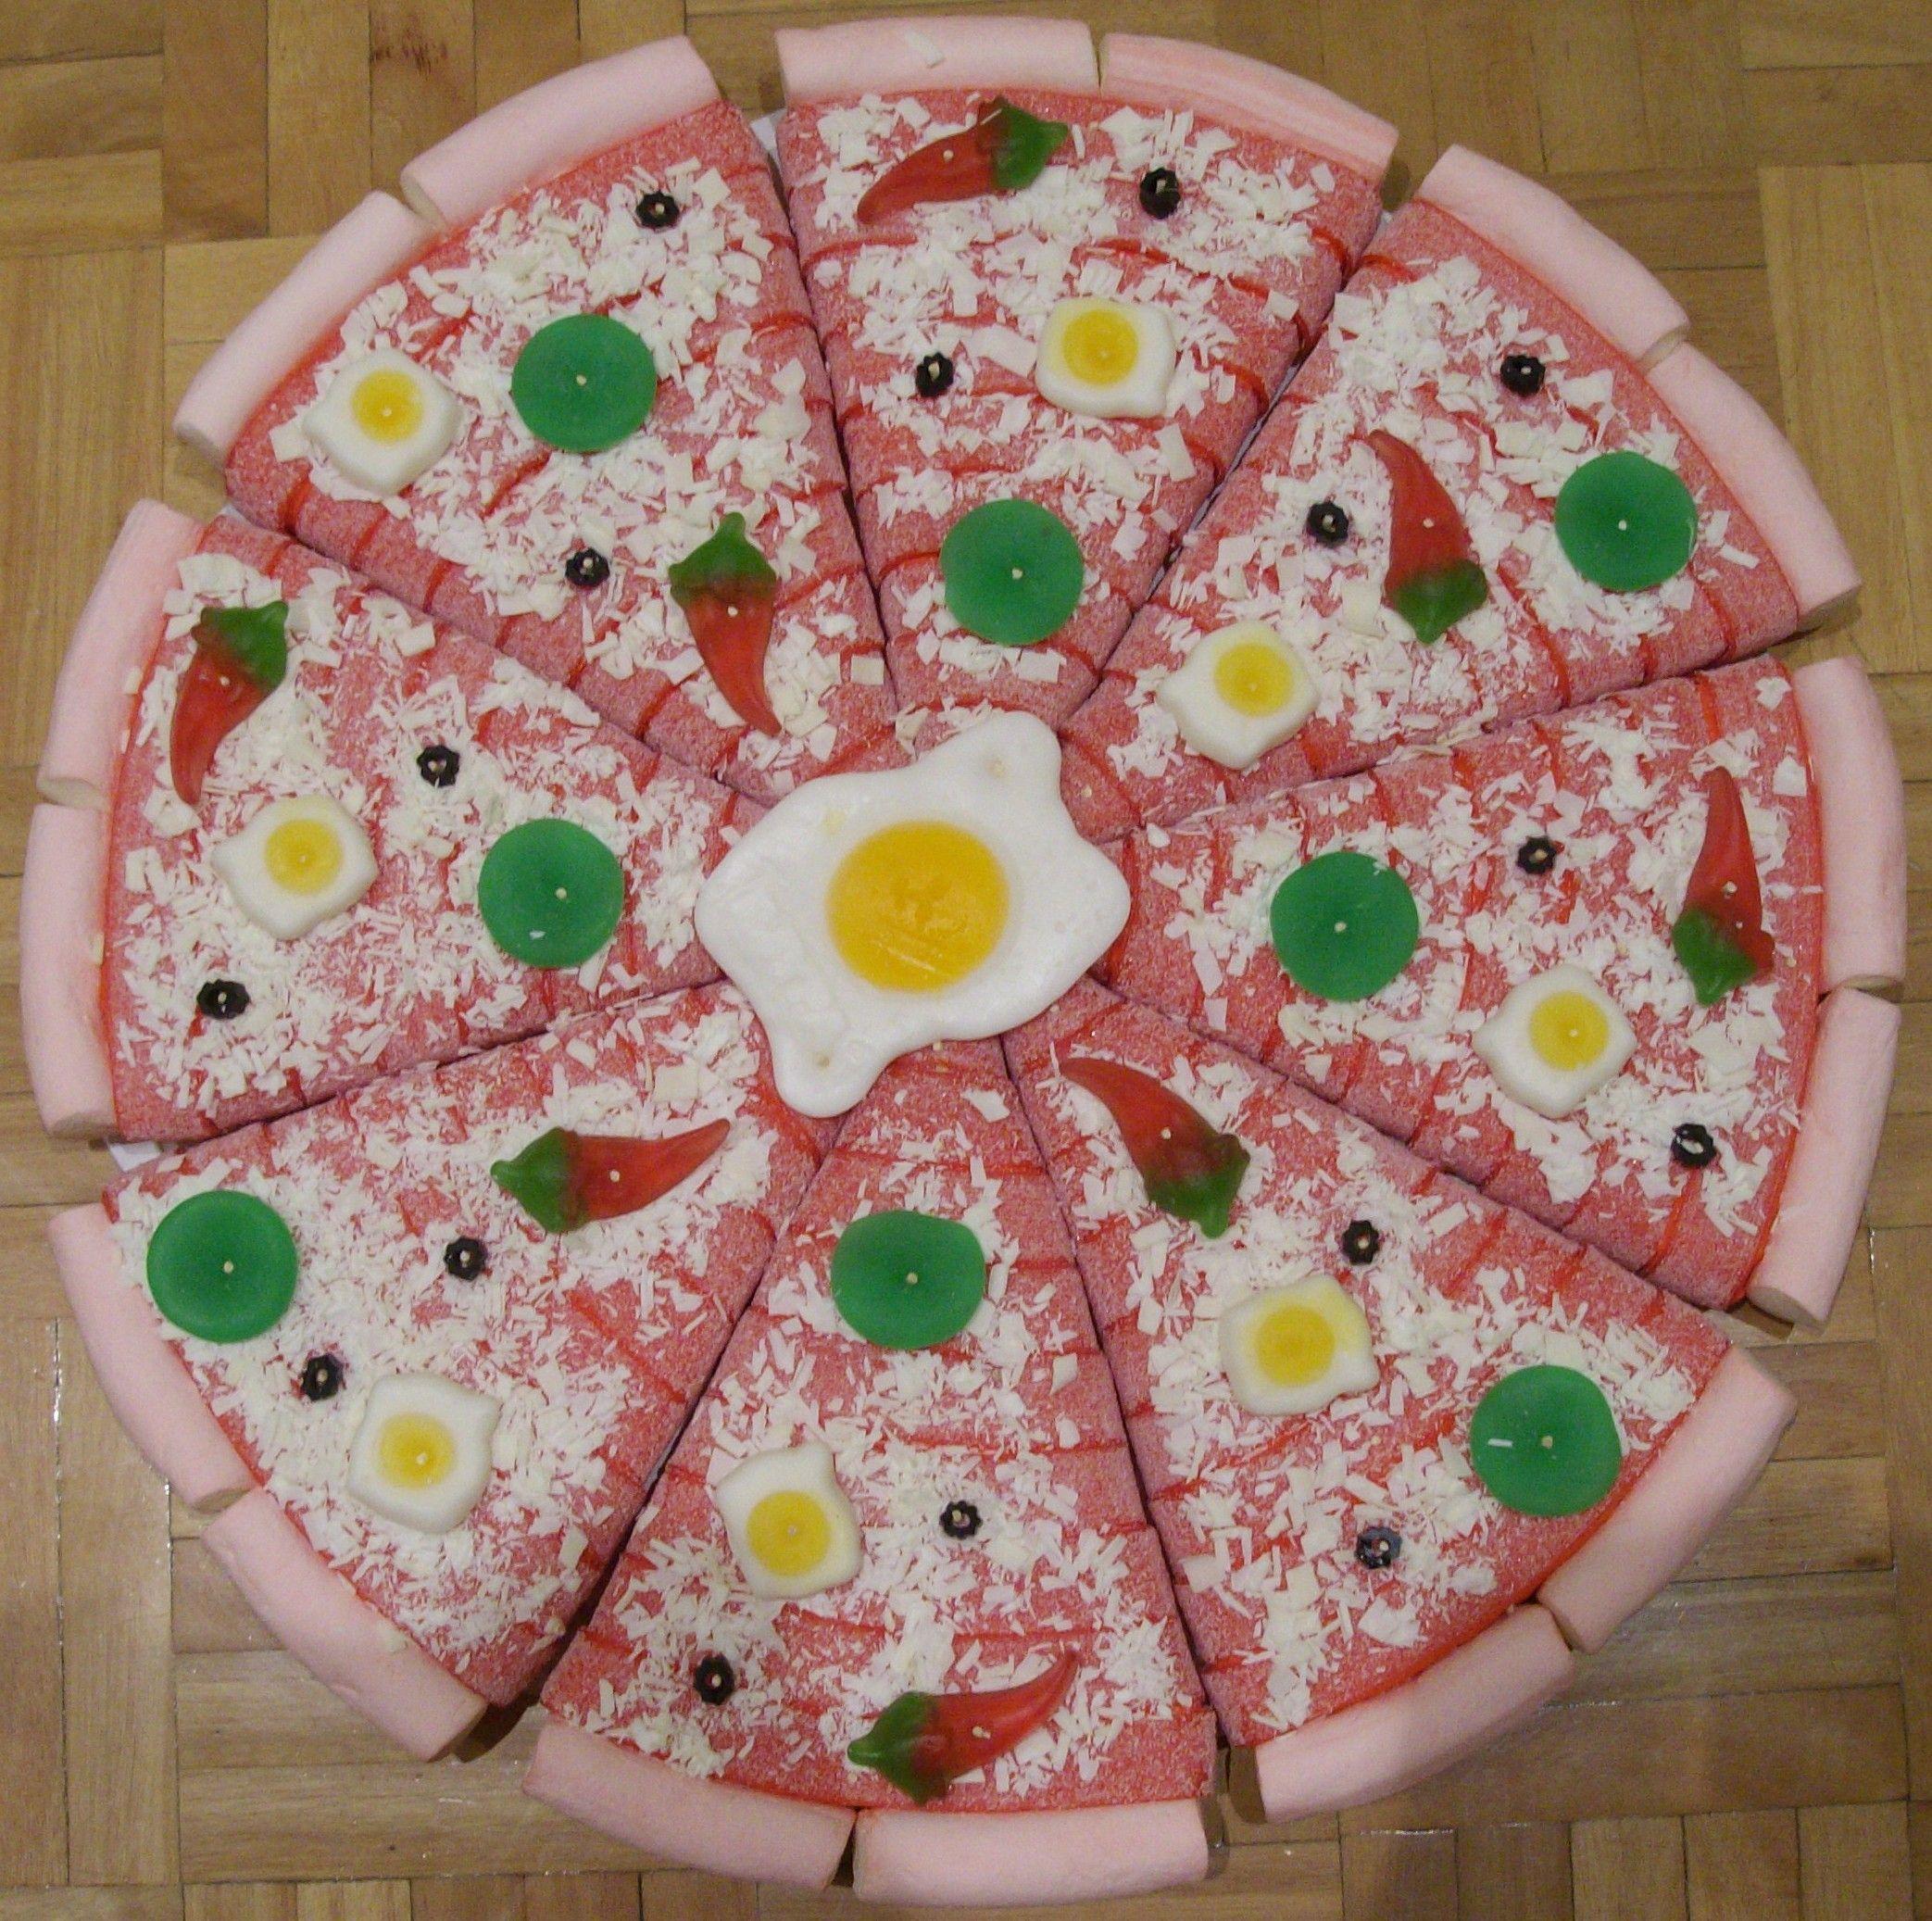 pizza de gominolas - Buscar con Google | Tartas de chuches